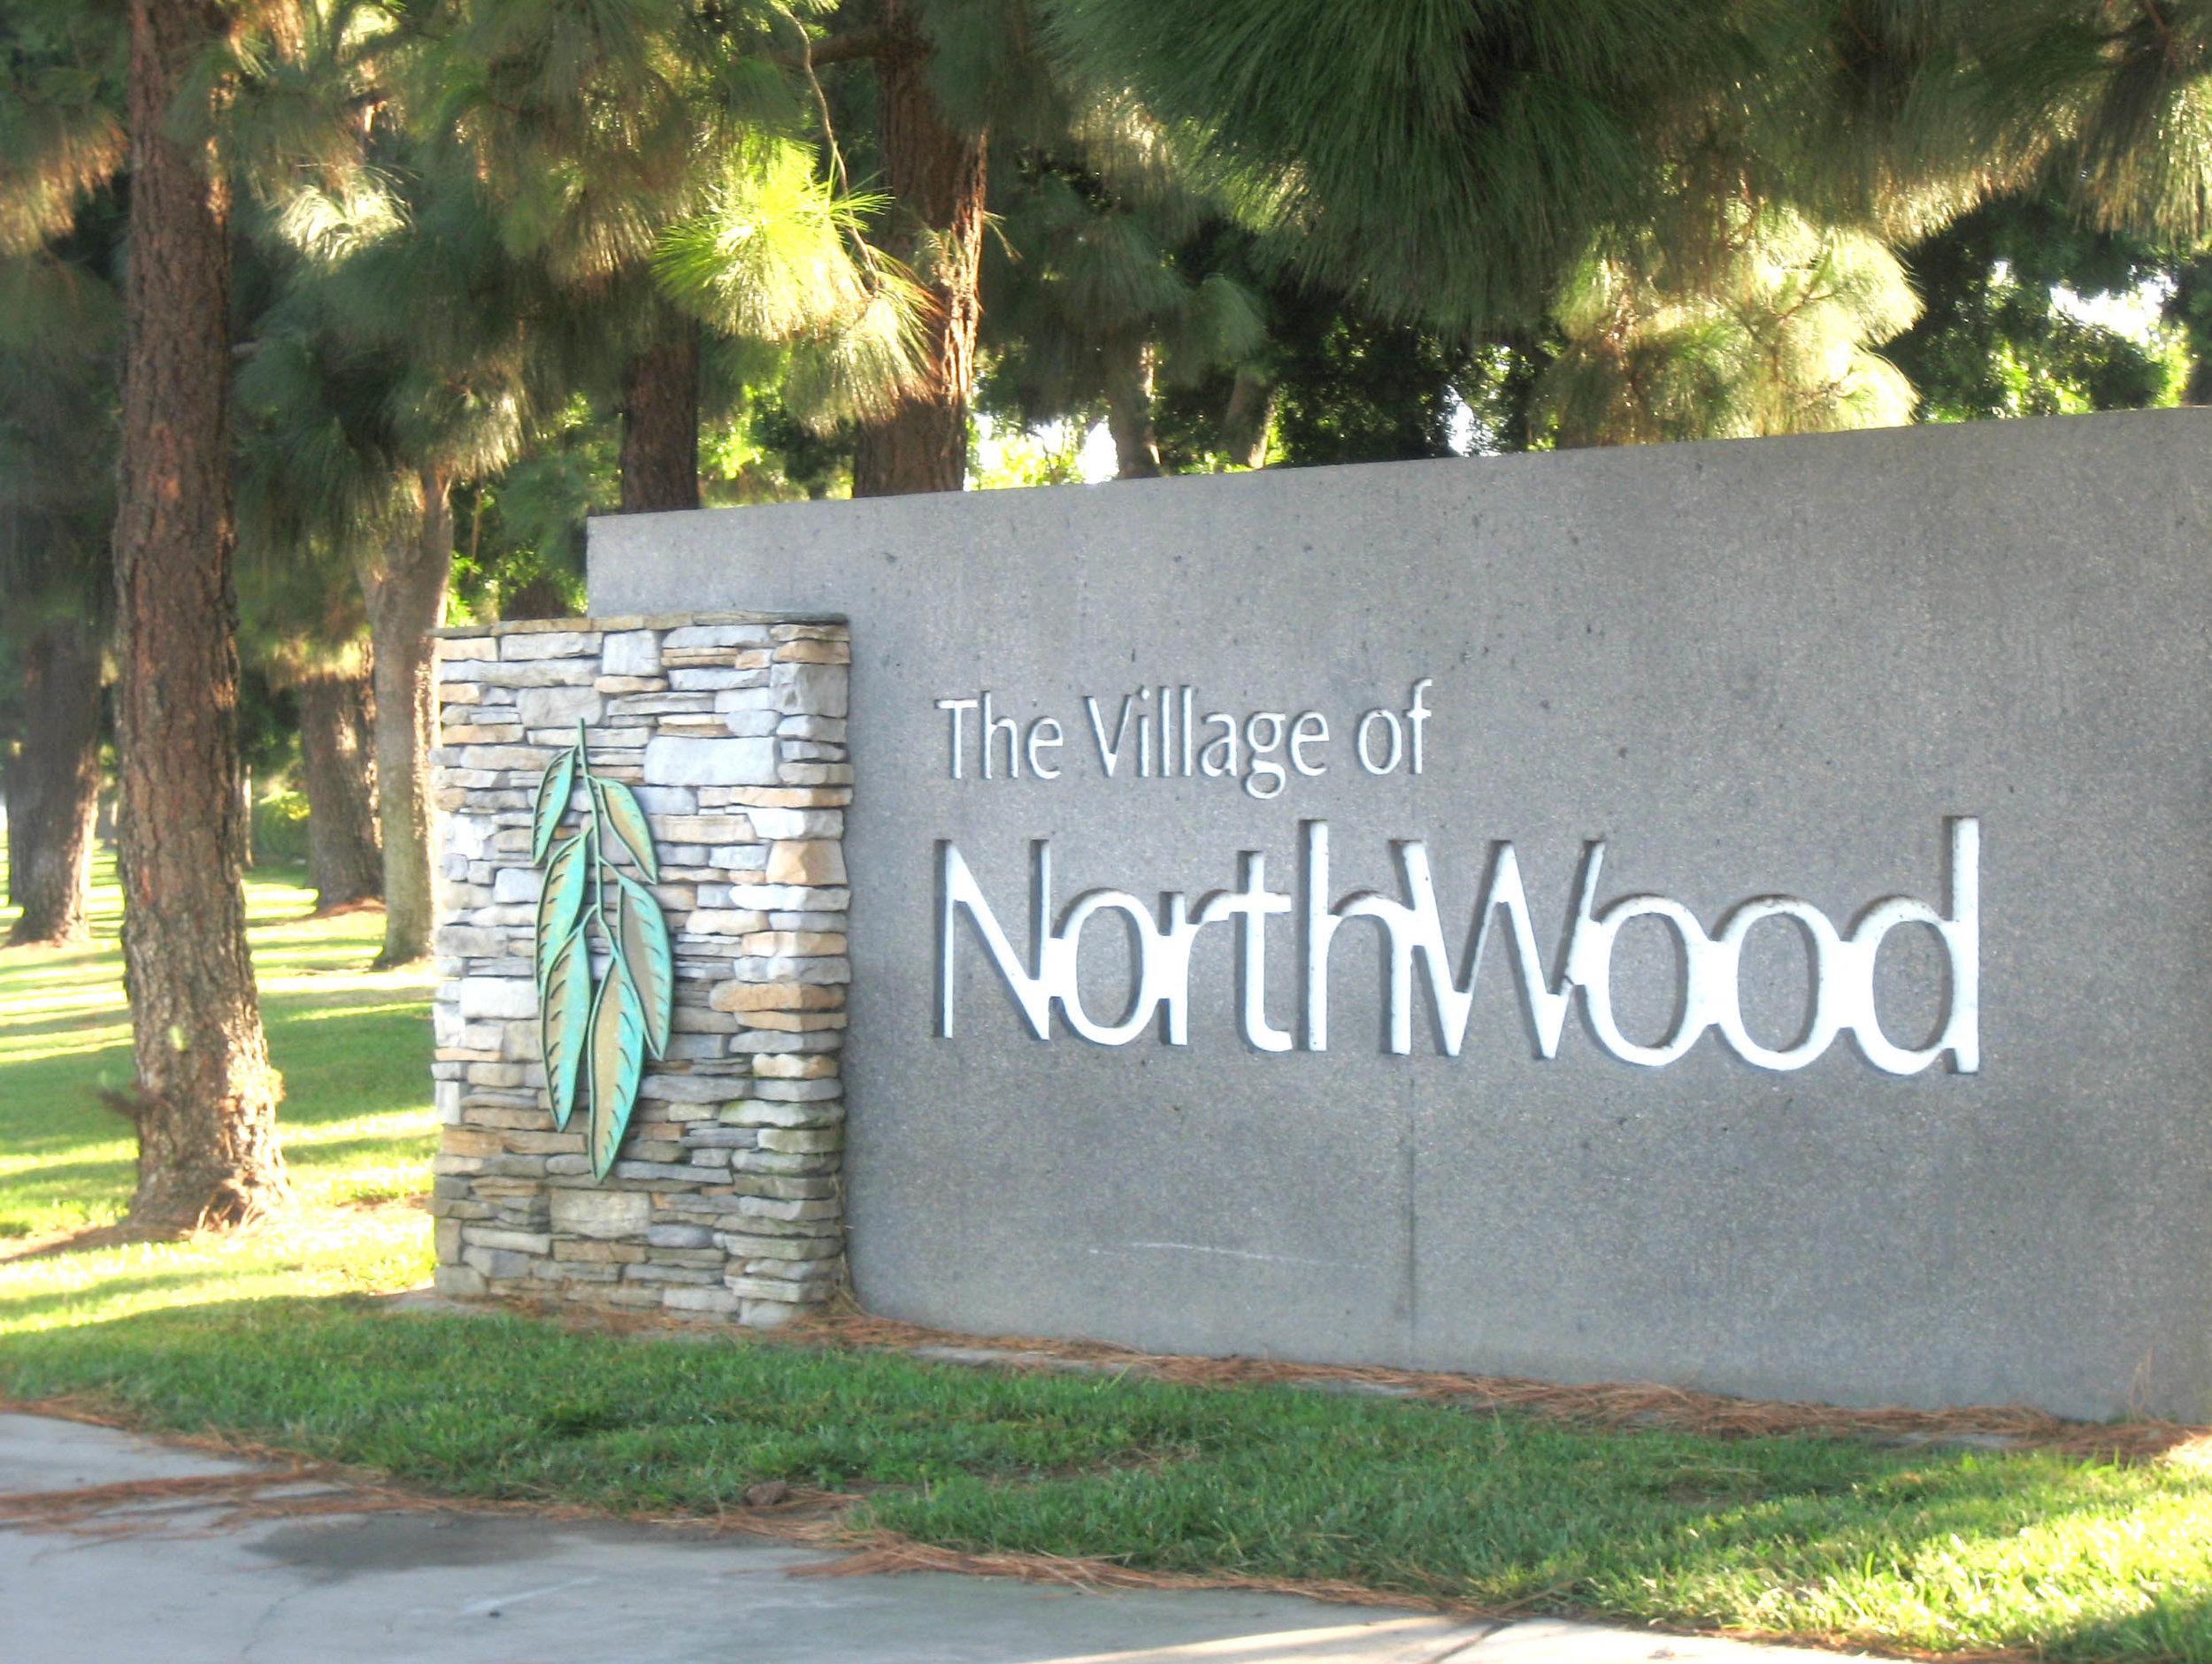 Northwood-Irvine-California-Sign.jpg